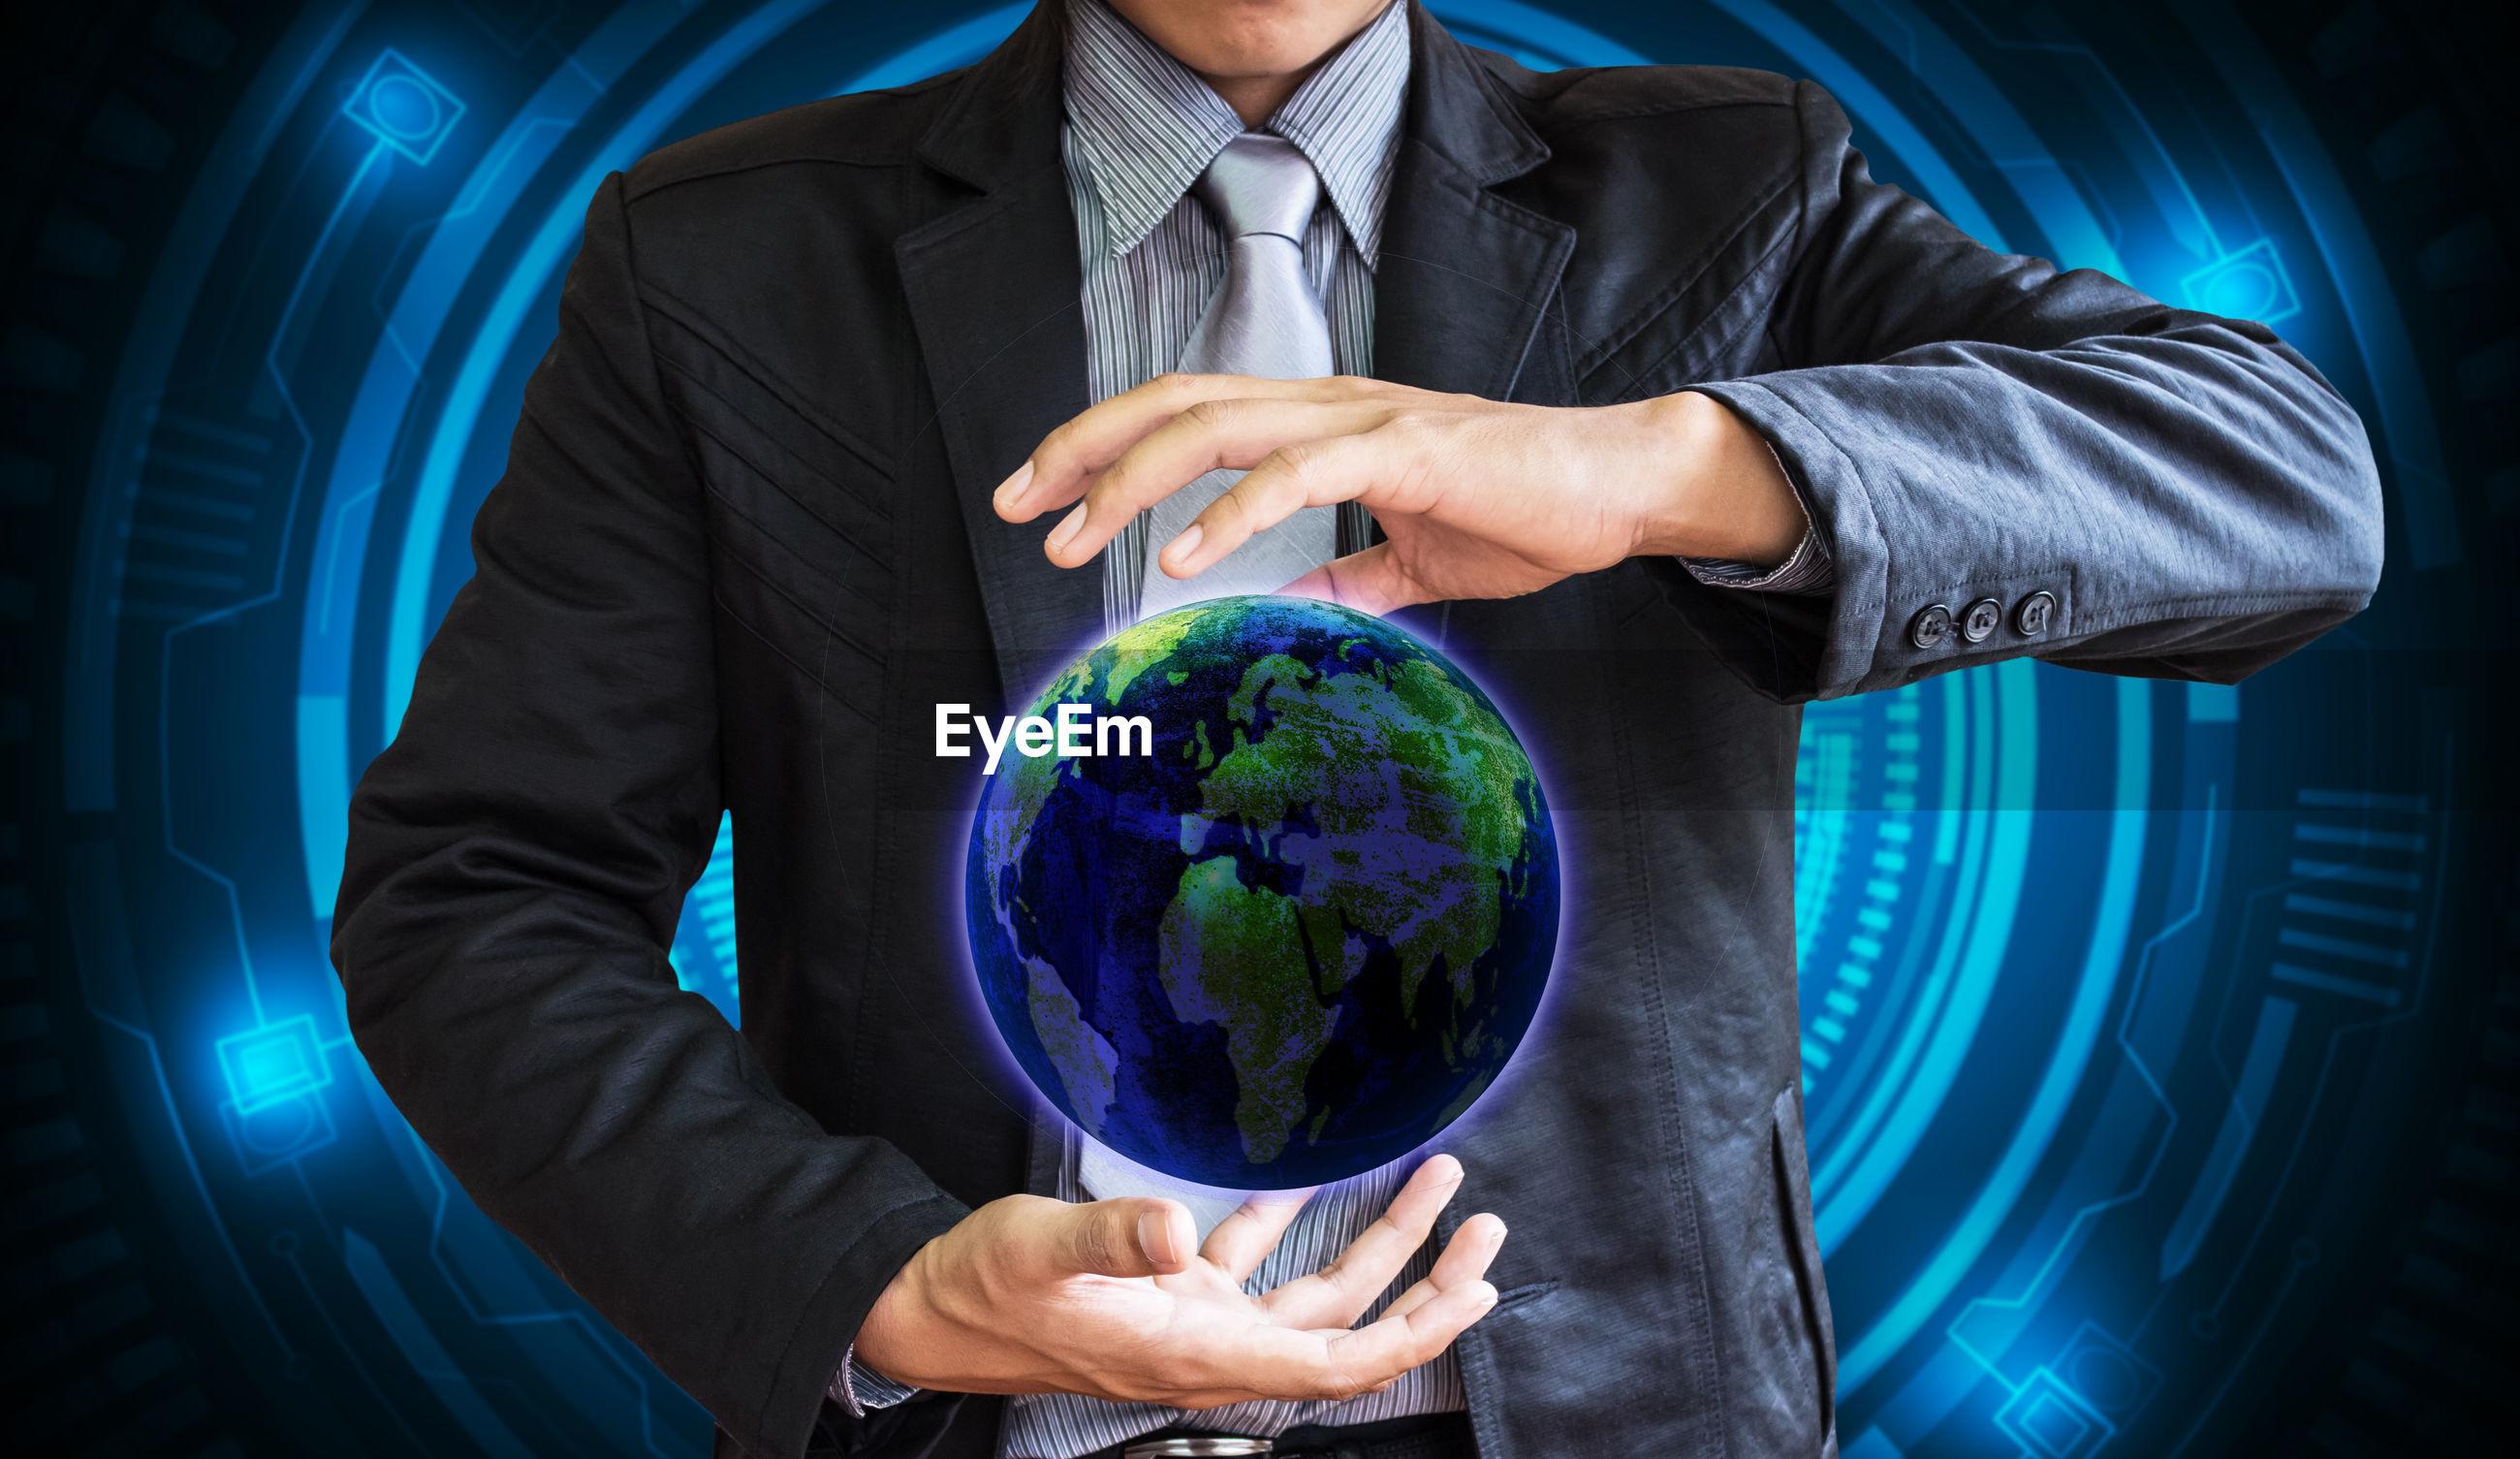 Digital composite image of businessman holding planet earth